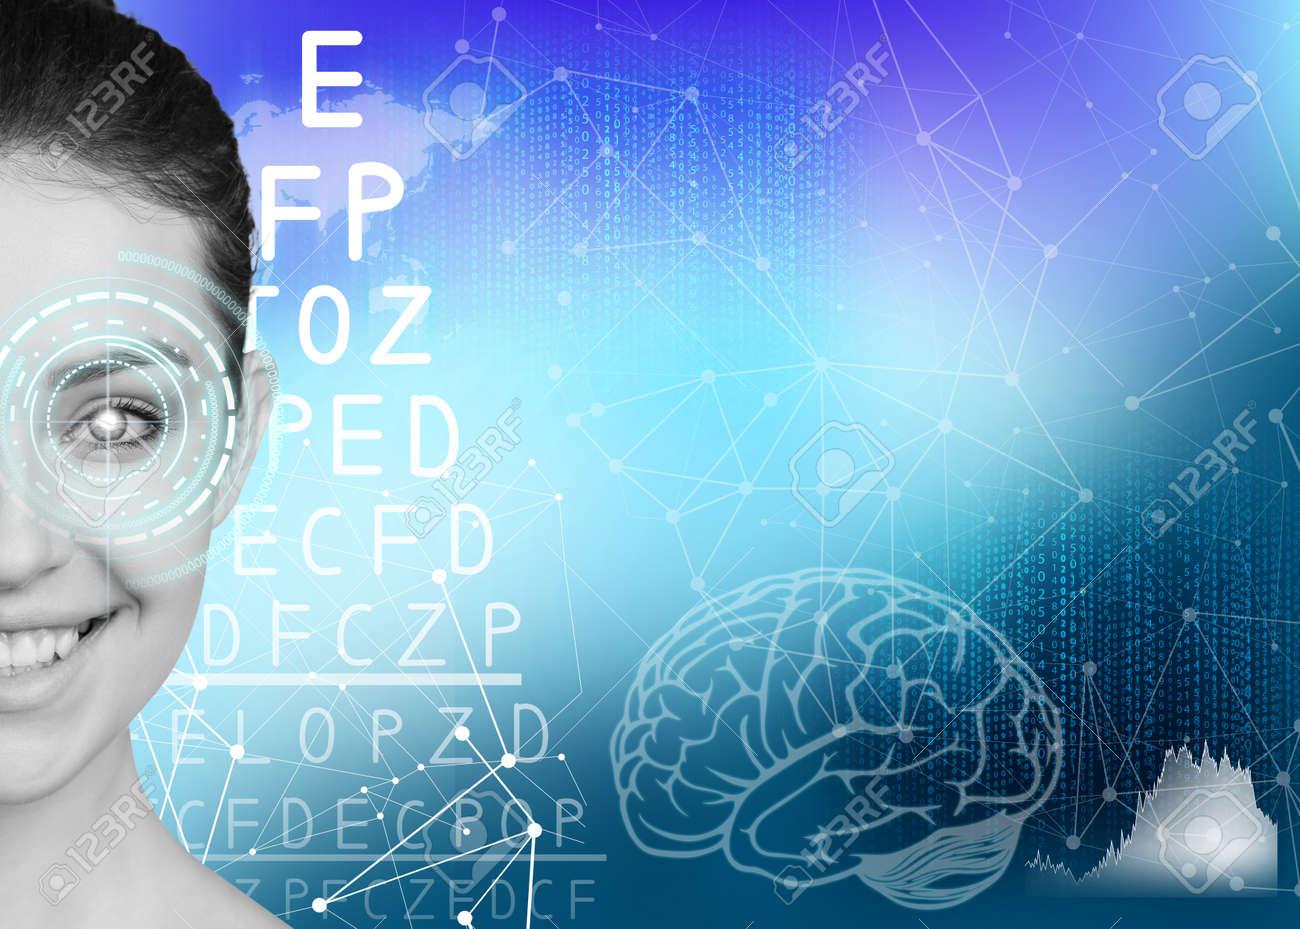 58462a5f448 Woman on eyesight exam with alphabet on blue background Stock Photo -  49693813